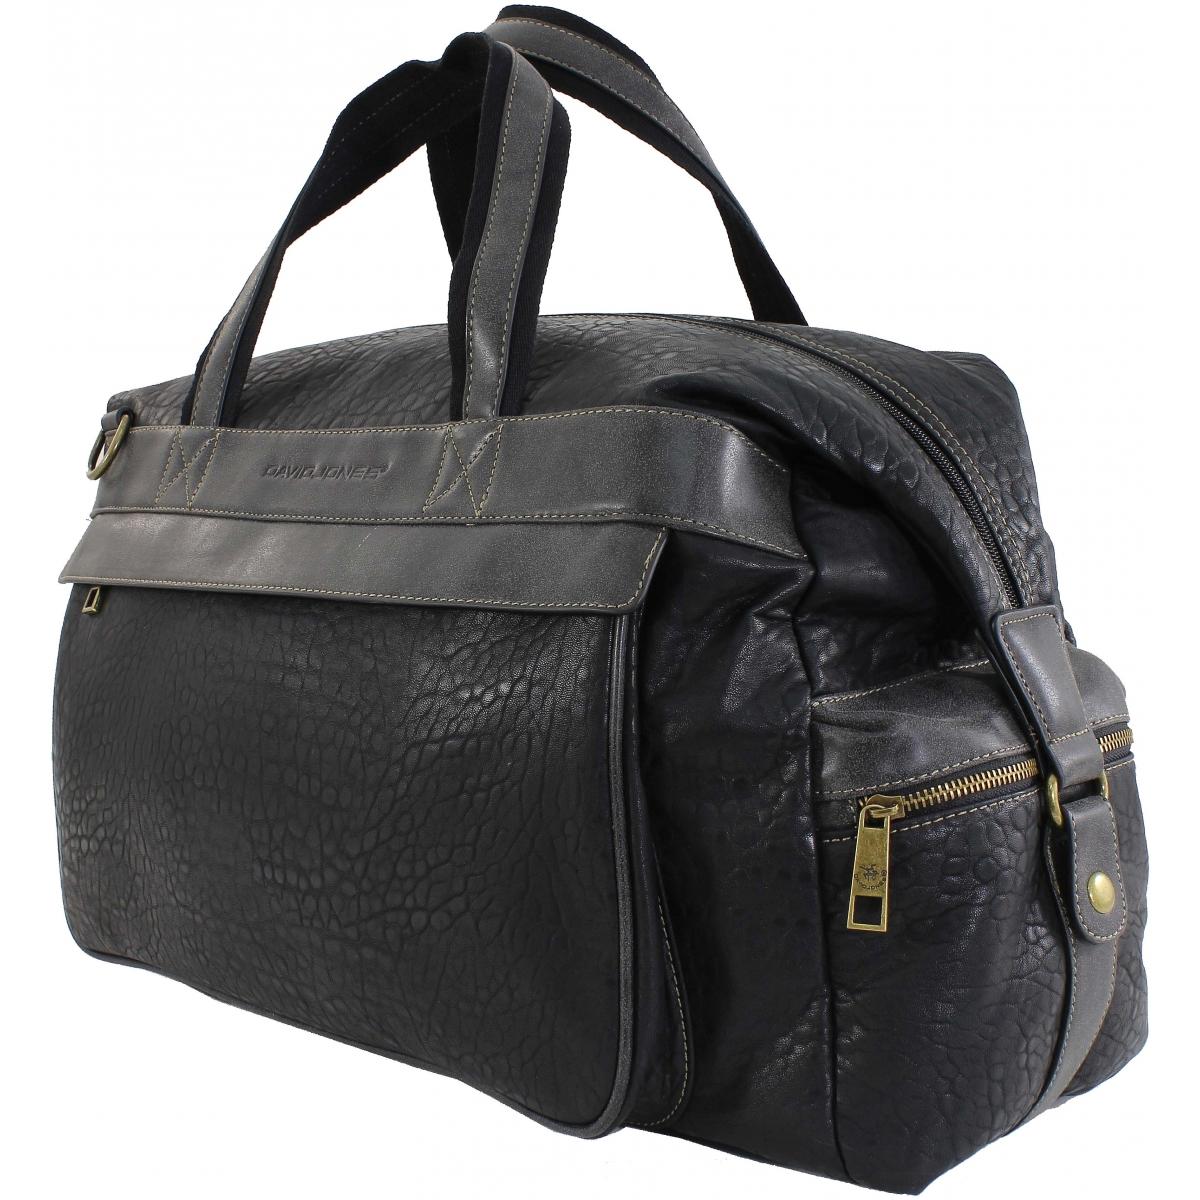 sac de voyage 48h david jones djcm0798a couleur principale black. Black Bedroom Furniture Sets. Home Design Ideas